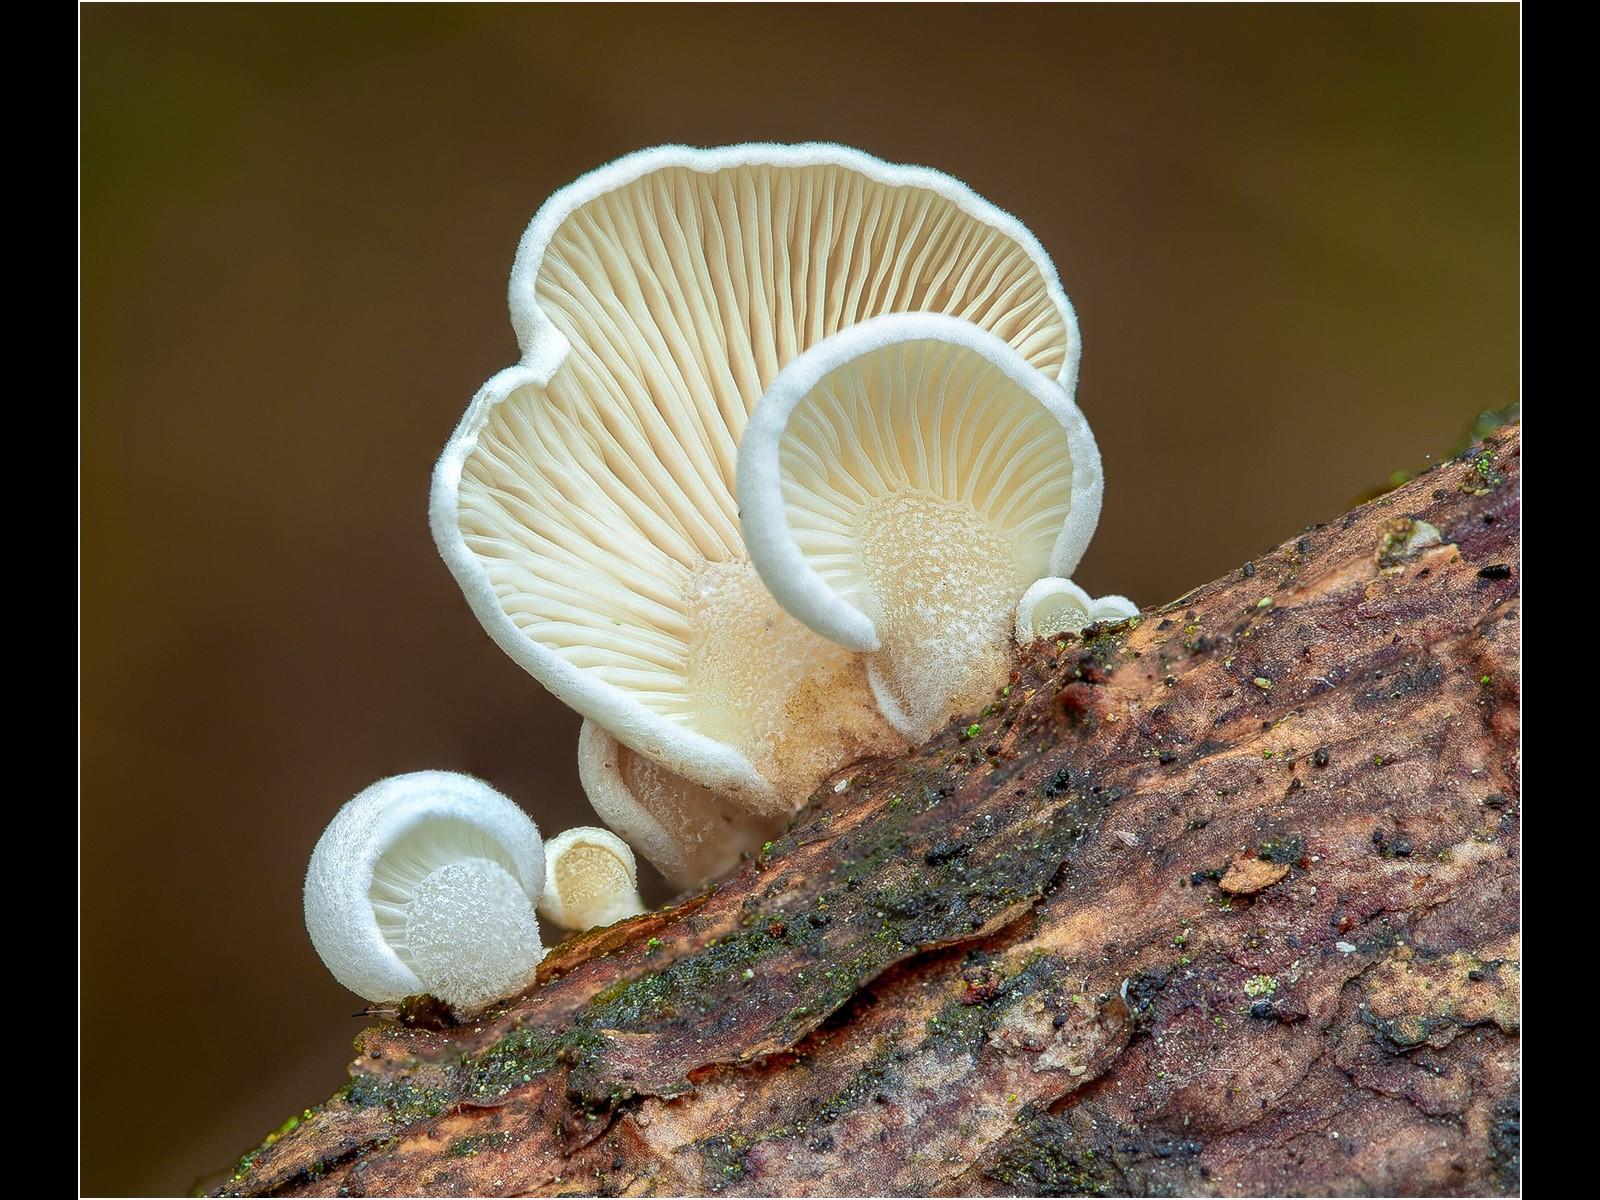 Crepidotus Variabilis